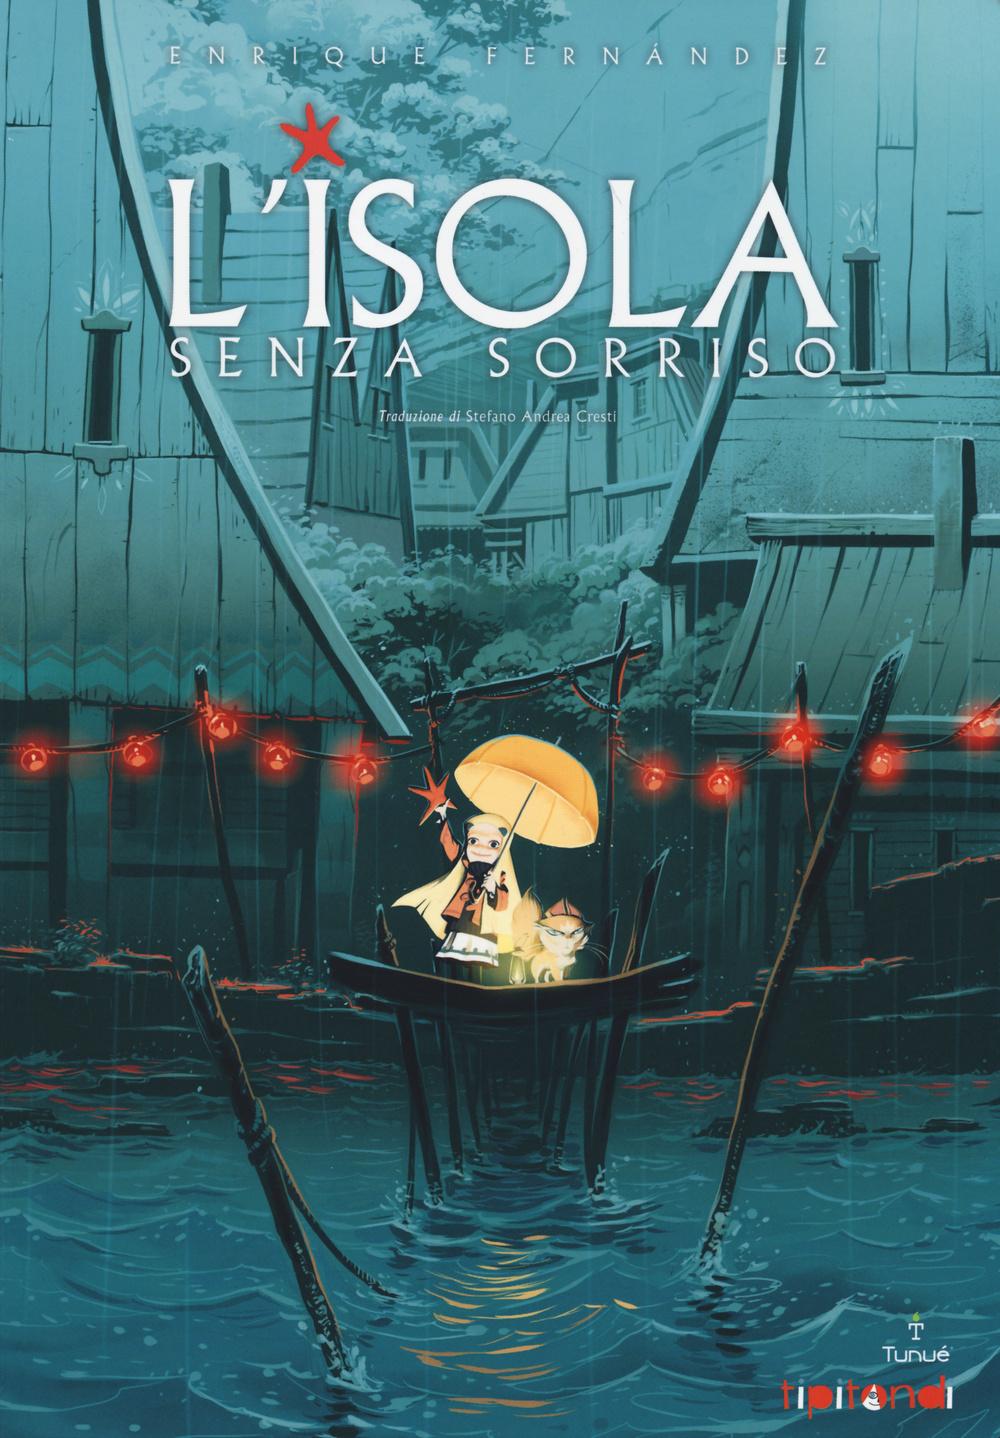 L'ISOLA SENZA SORRISO - 9788897165842